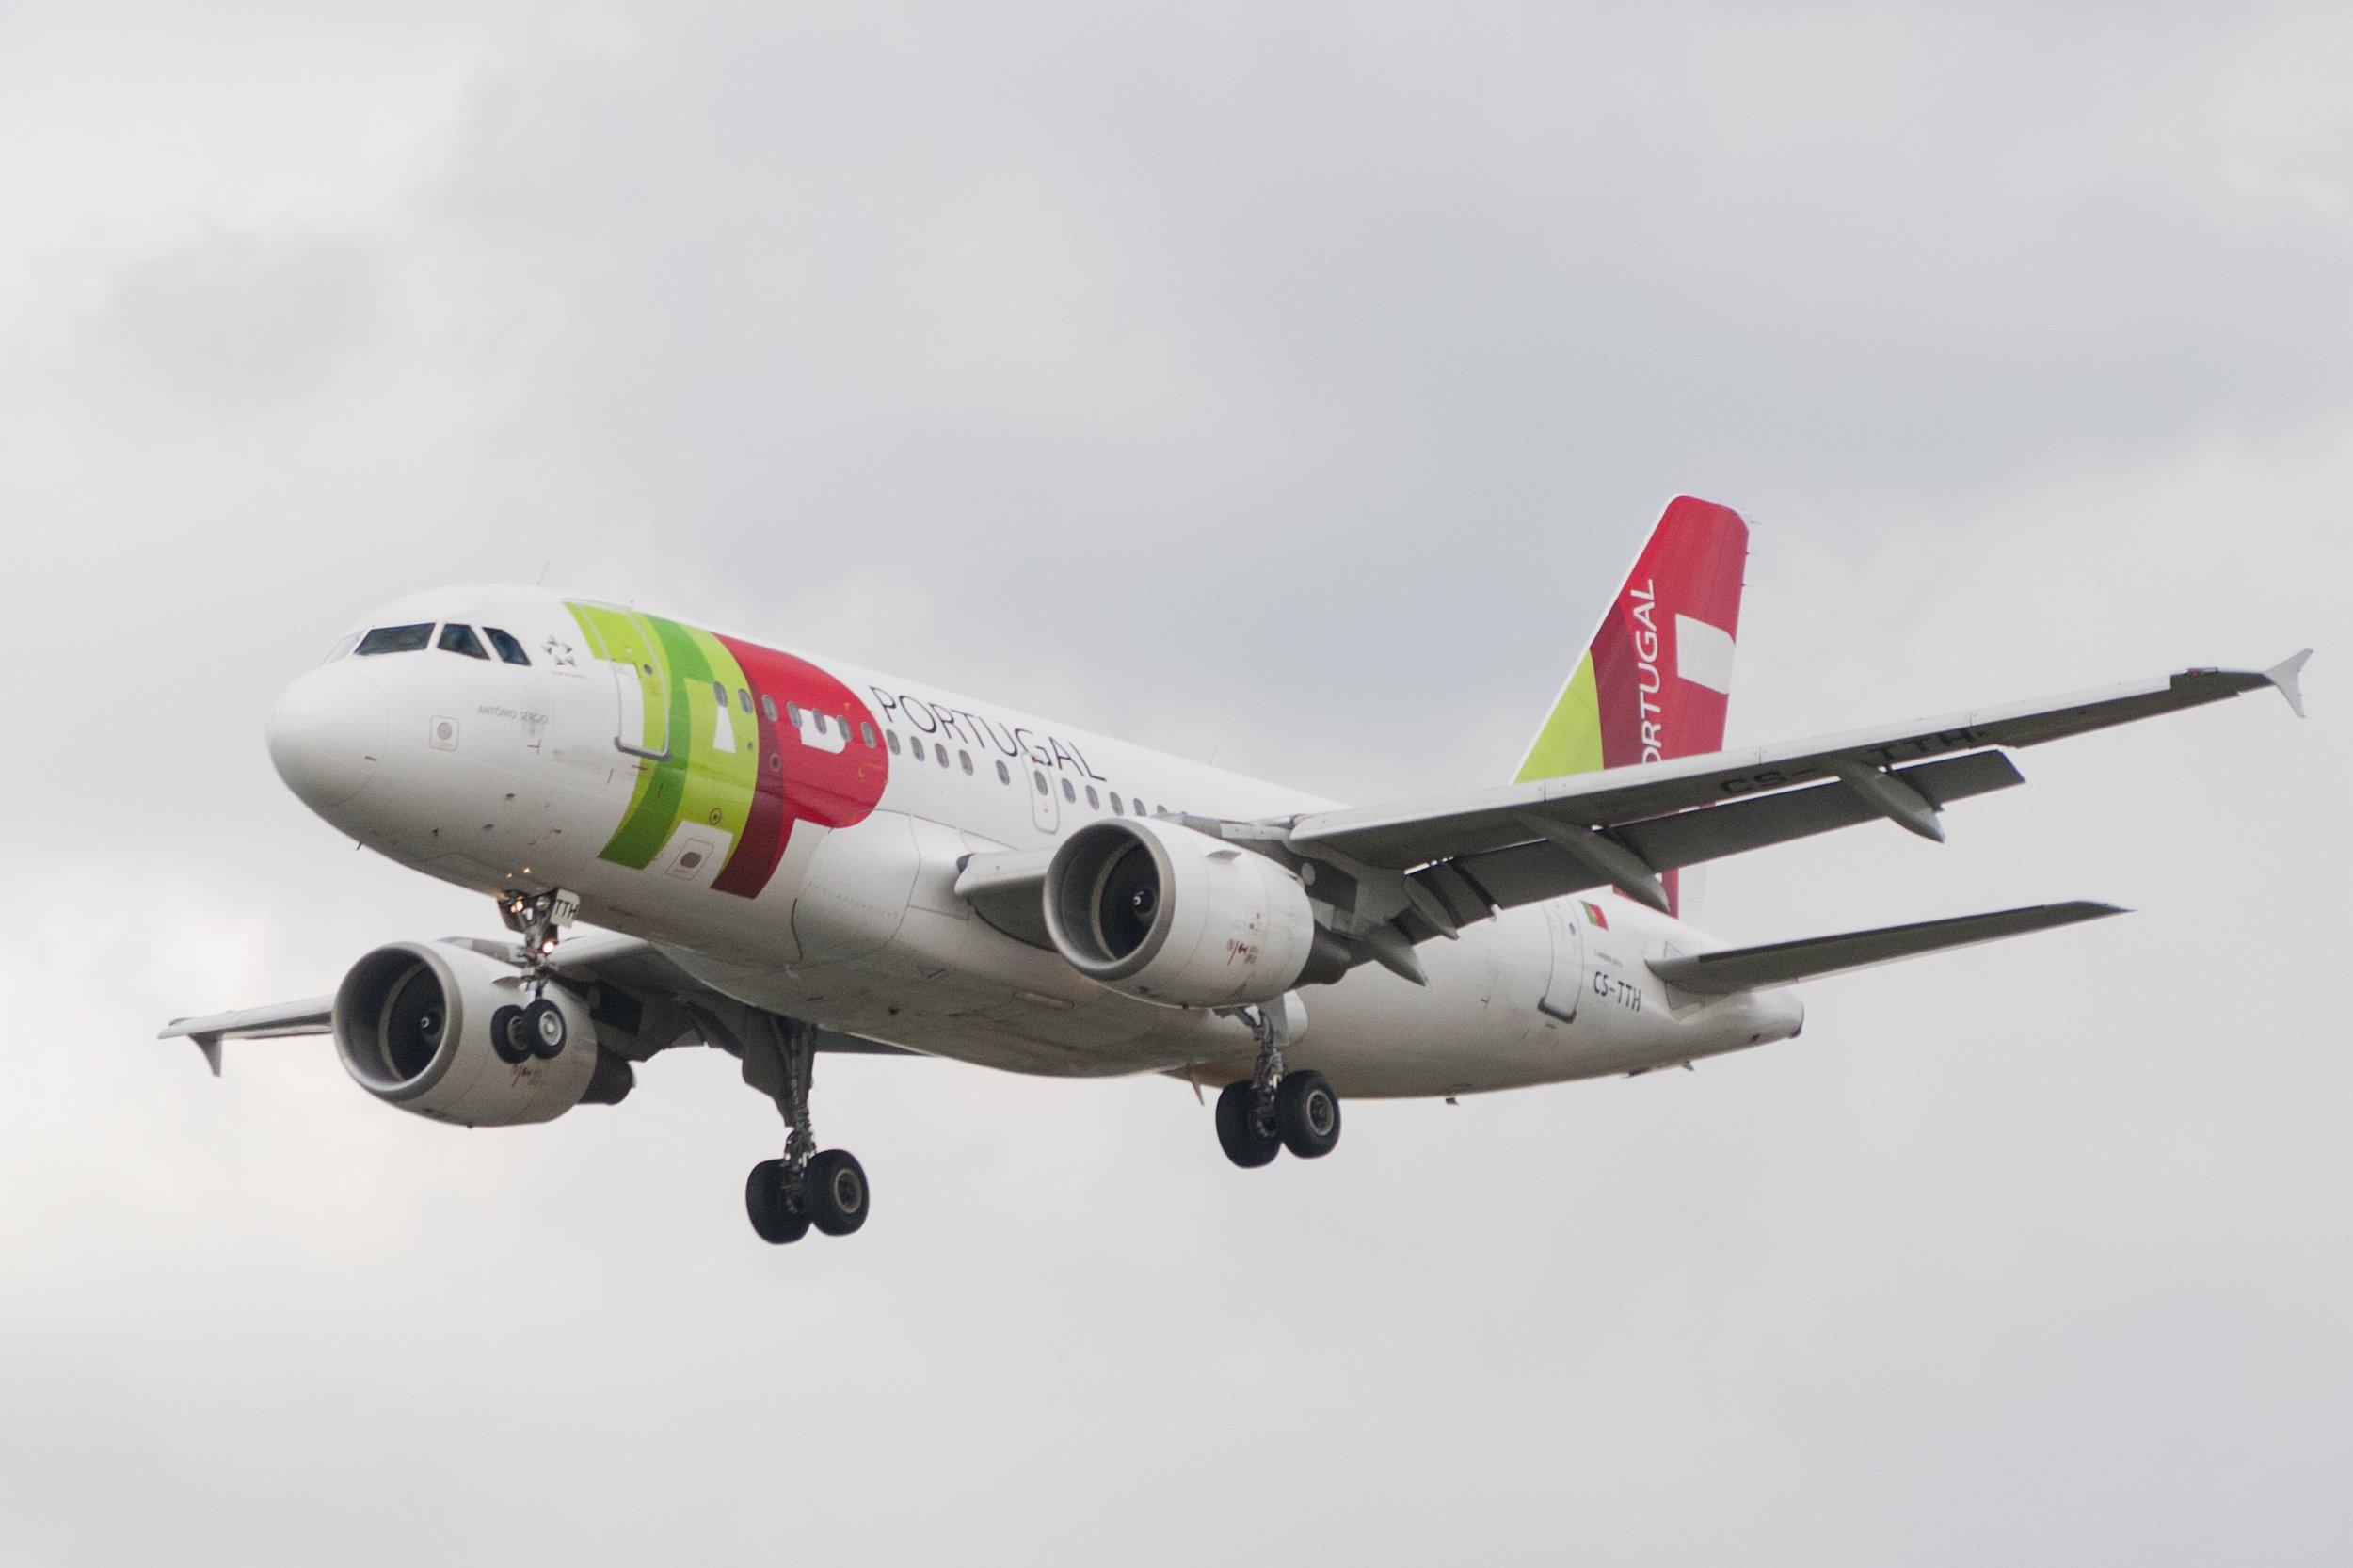 12 TAP Air Portugal